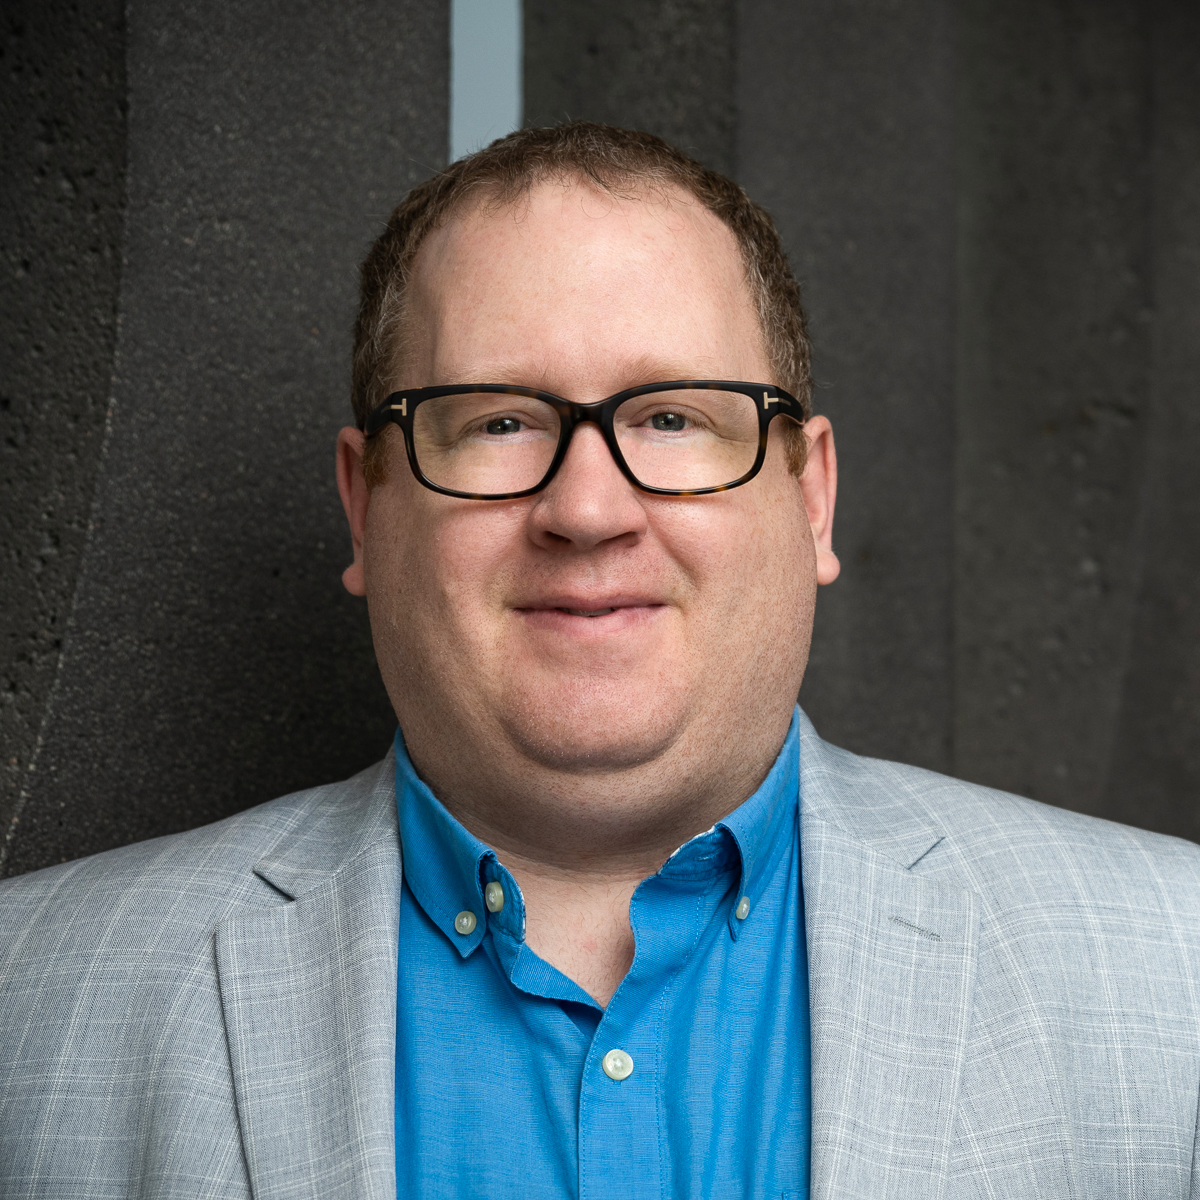 University of Guelph professor Ryan Gibson